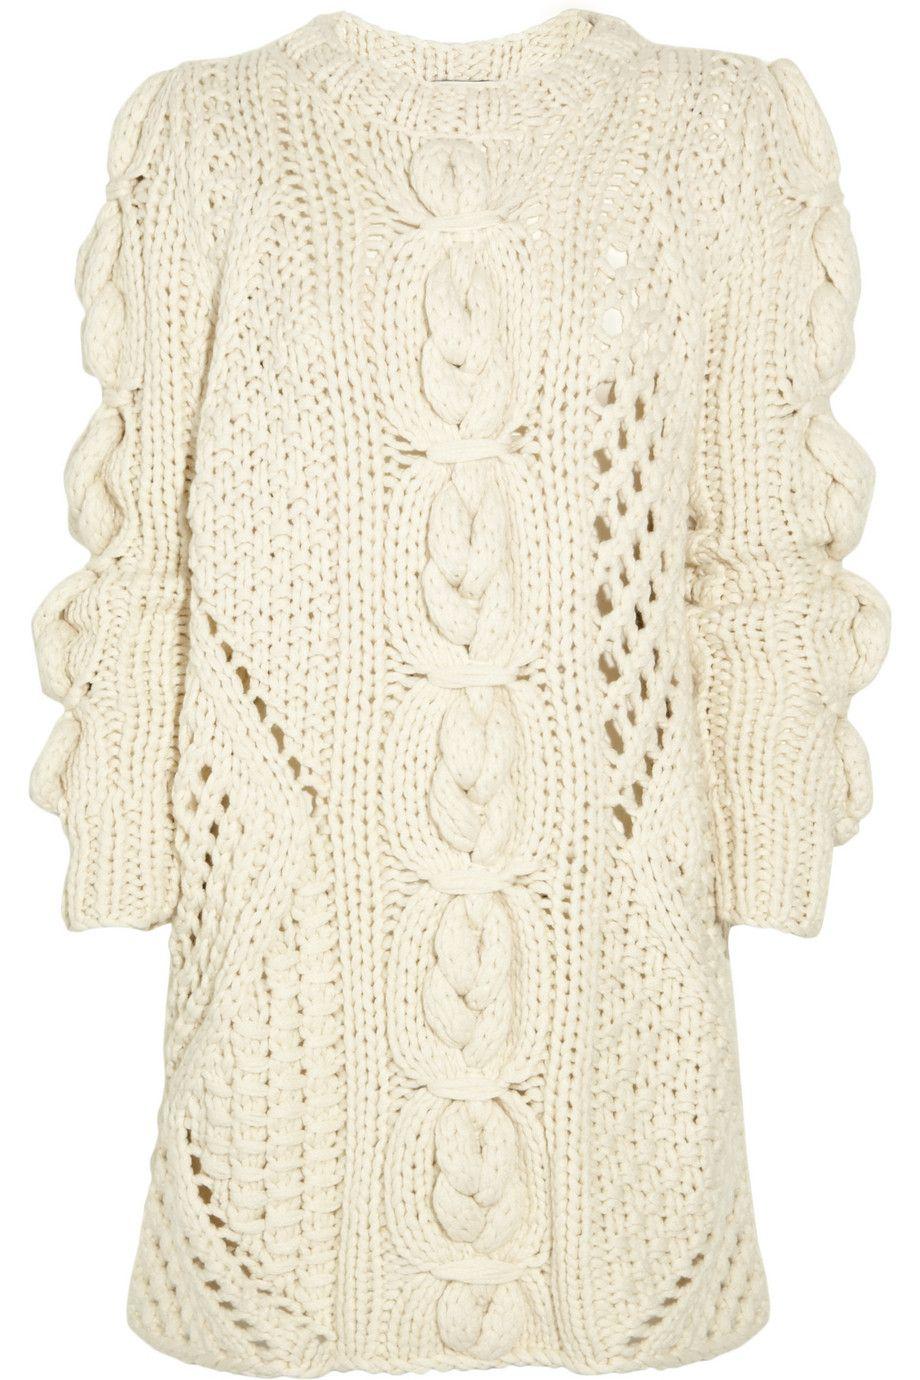 Pringle of Scotland Aran-knit cashmere sweater dress | aran ...